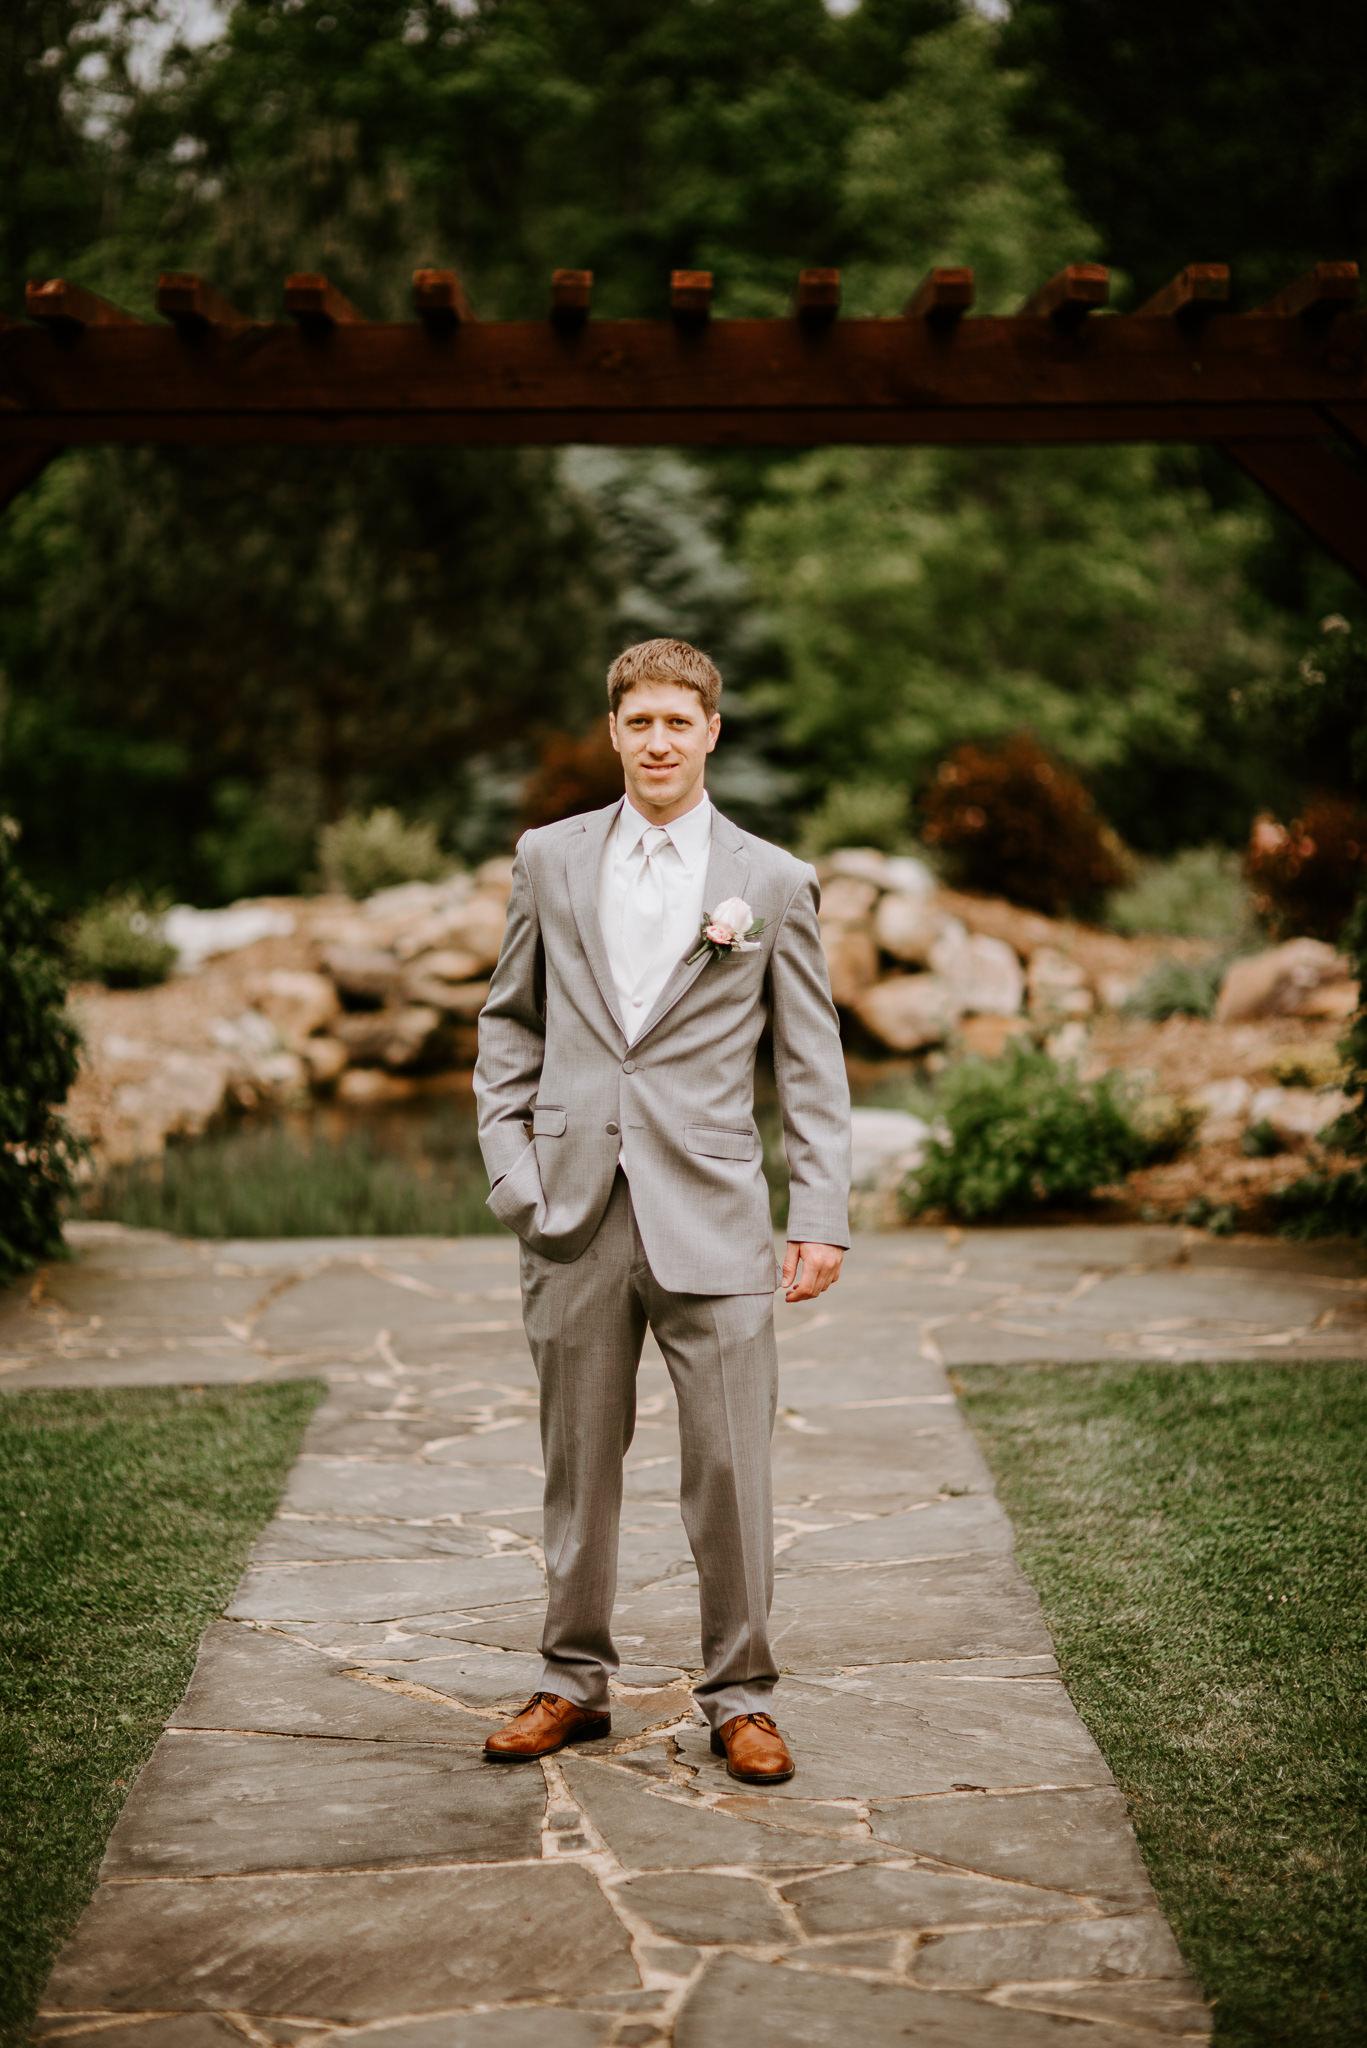 House Mountain Inn - Weddings - Lexington - Virginia - Best Wedding Photographer - Pat Cori Photography-55.jpg